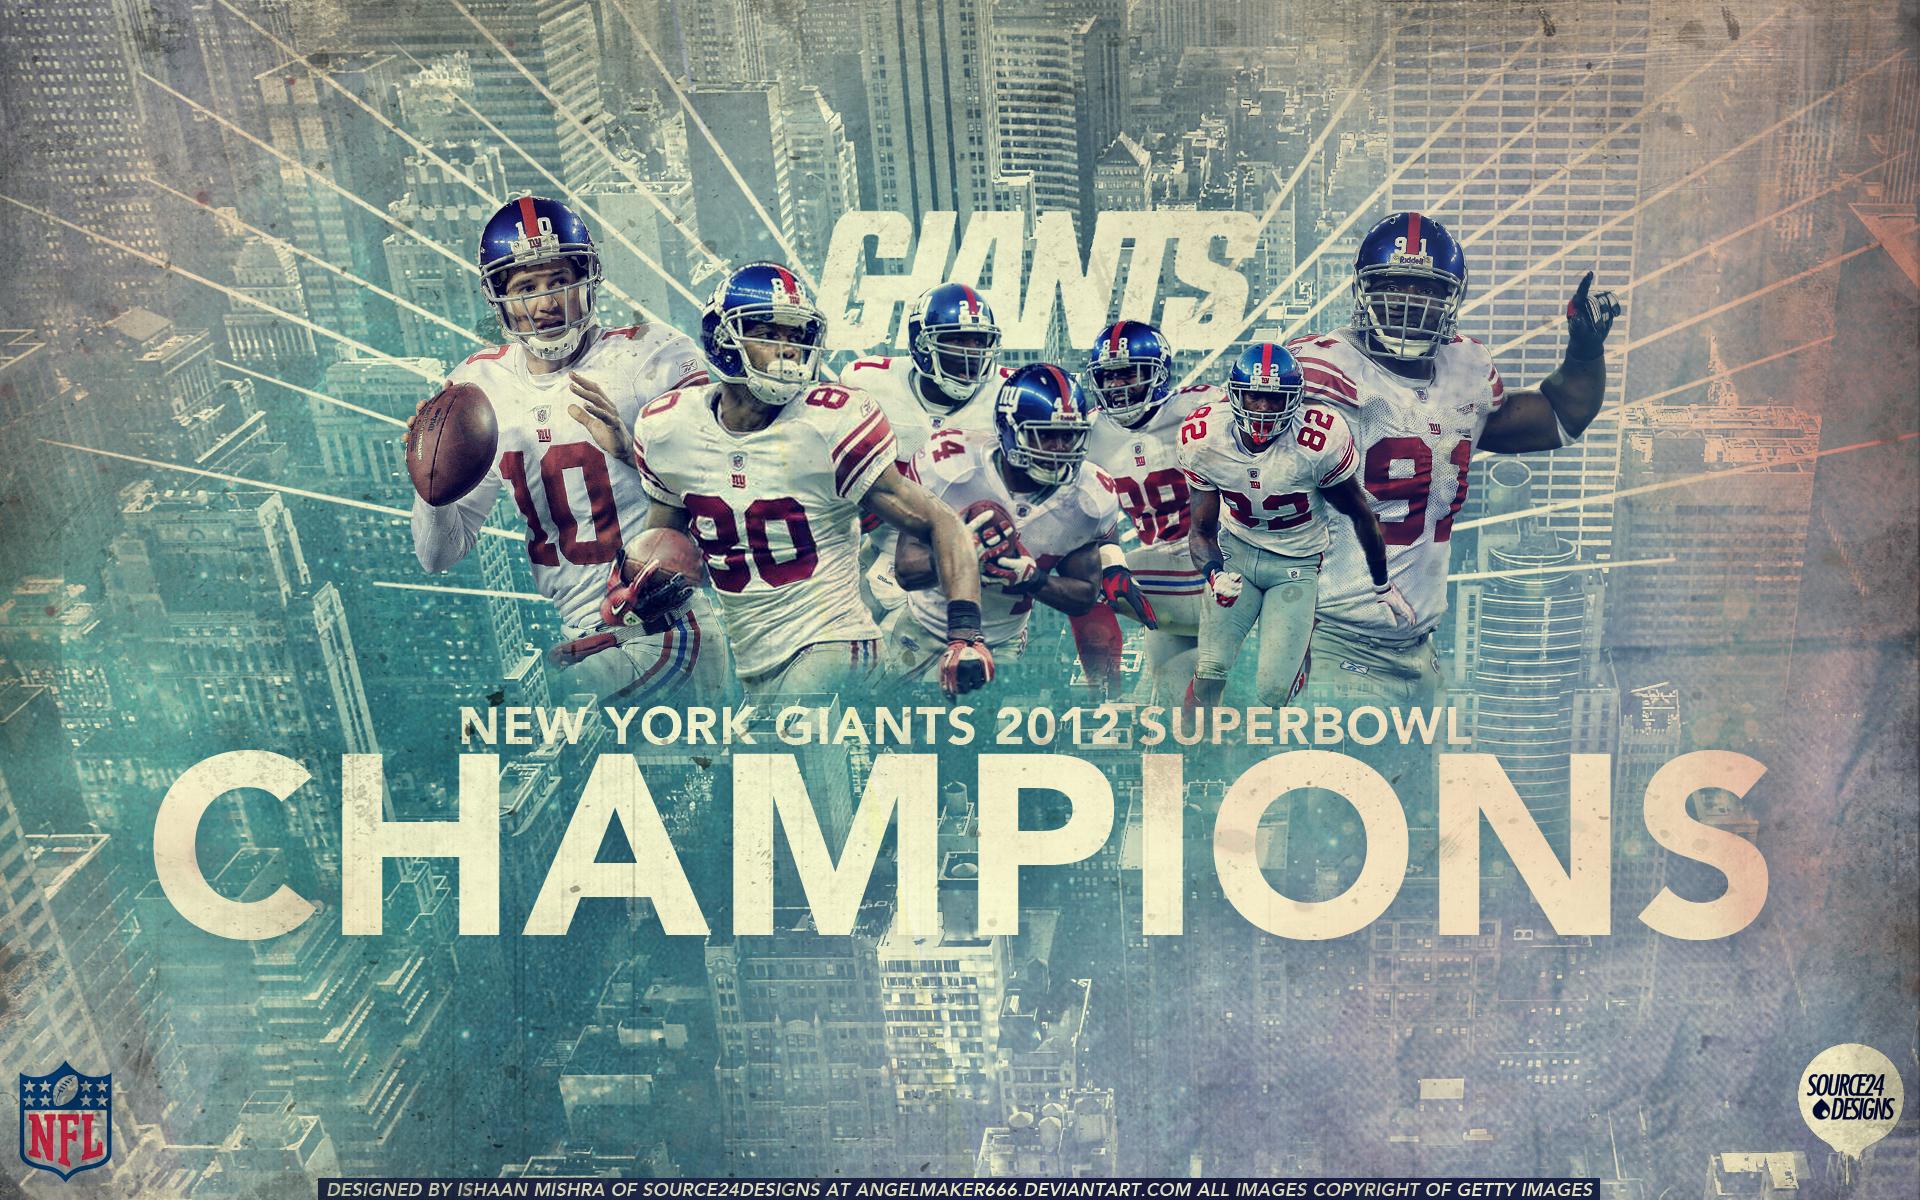 New york giants 2012 superbowl champions wallpaper by - Patriots super bowl champs wallpaper ...